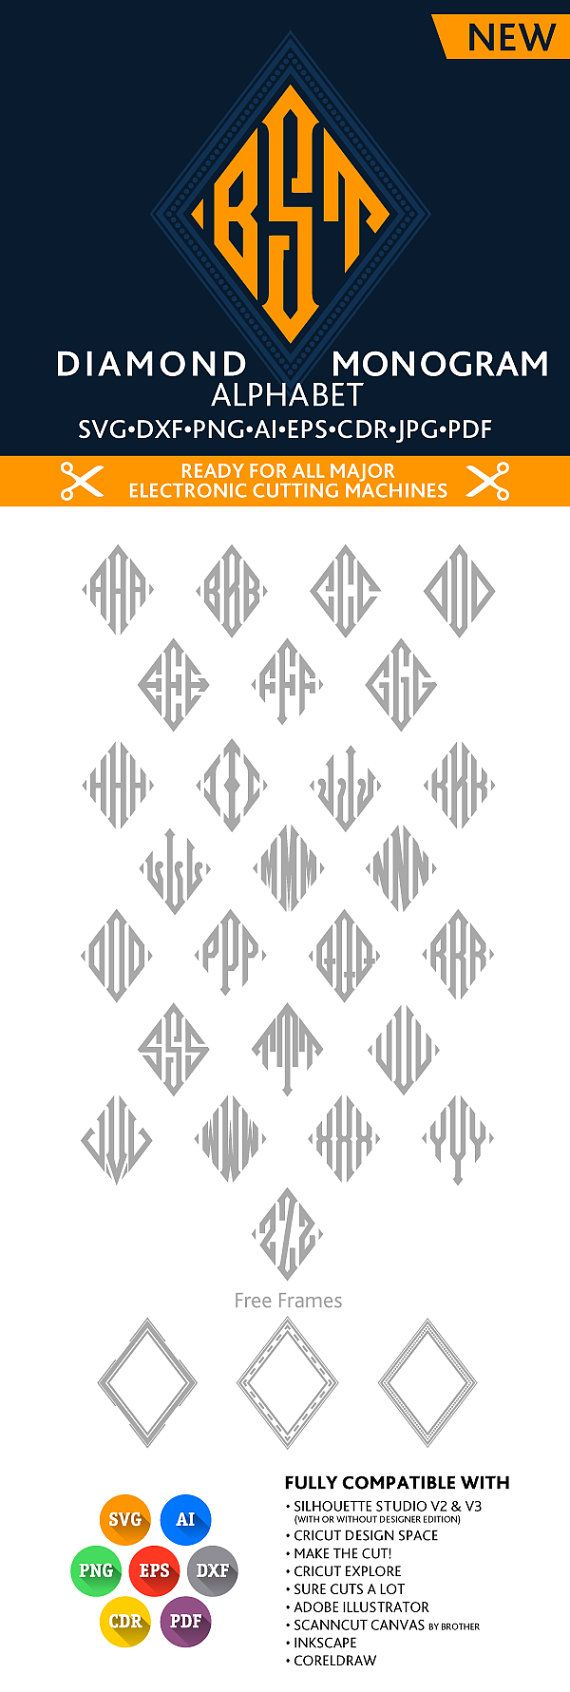 Diamond Monogram SVG Alphabet Svg DXF EPS Silhouette Studio Png Pdf Jpg Ai Cdr digital cut files for Silhouette Studio, Cricut, Cameo